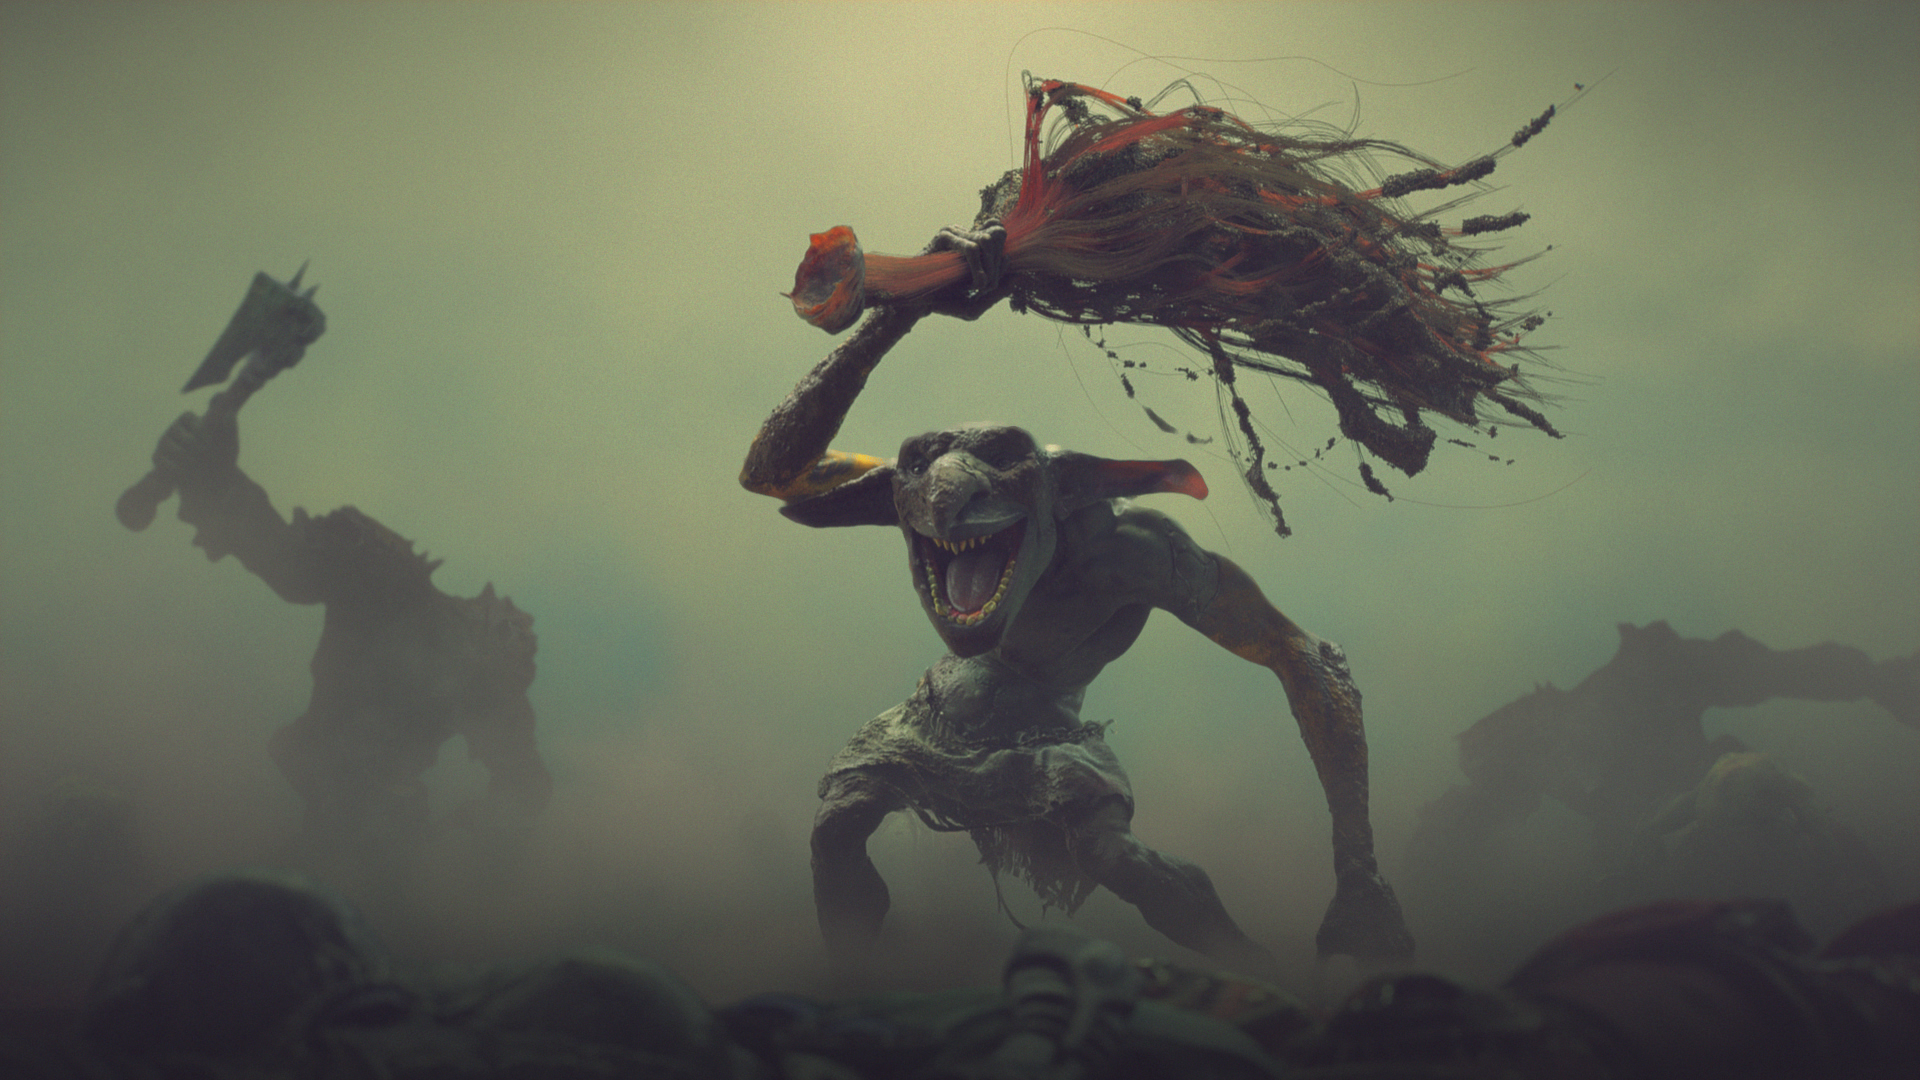 dawn of war 3 release